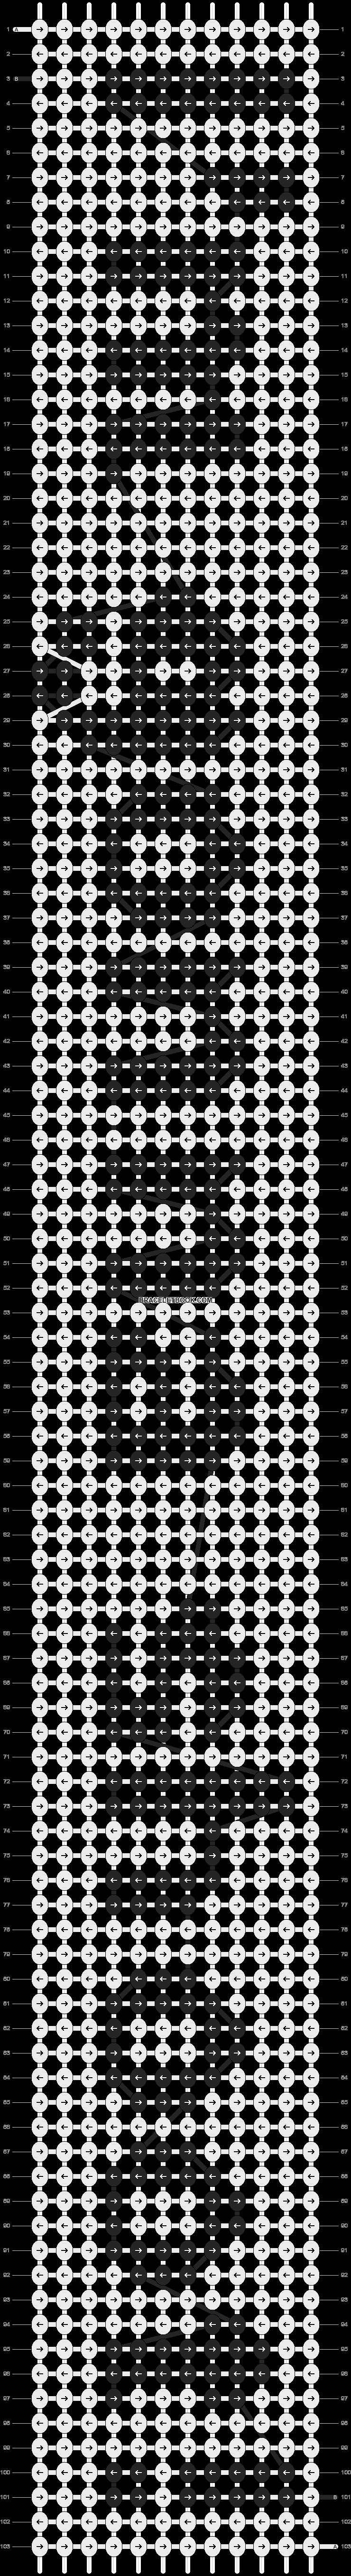 Alpha pattern #4221 pattern